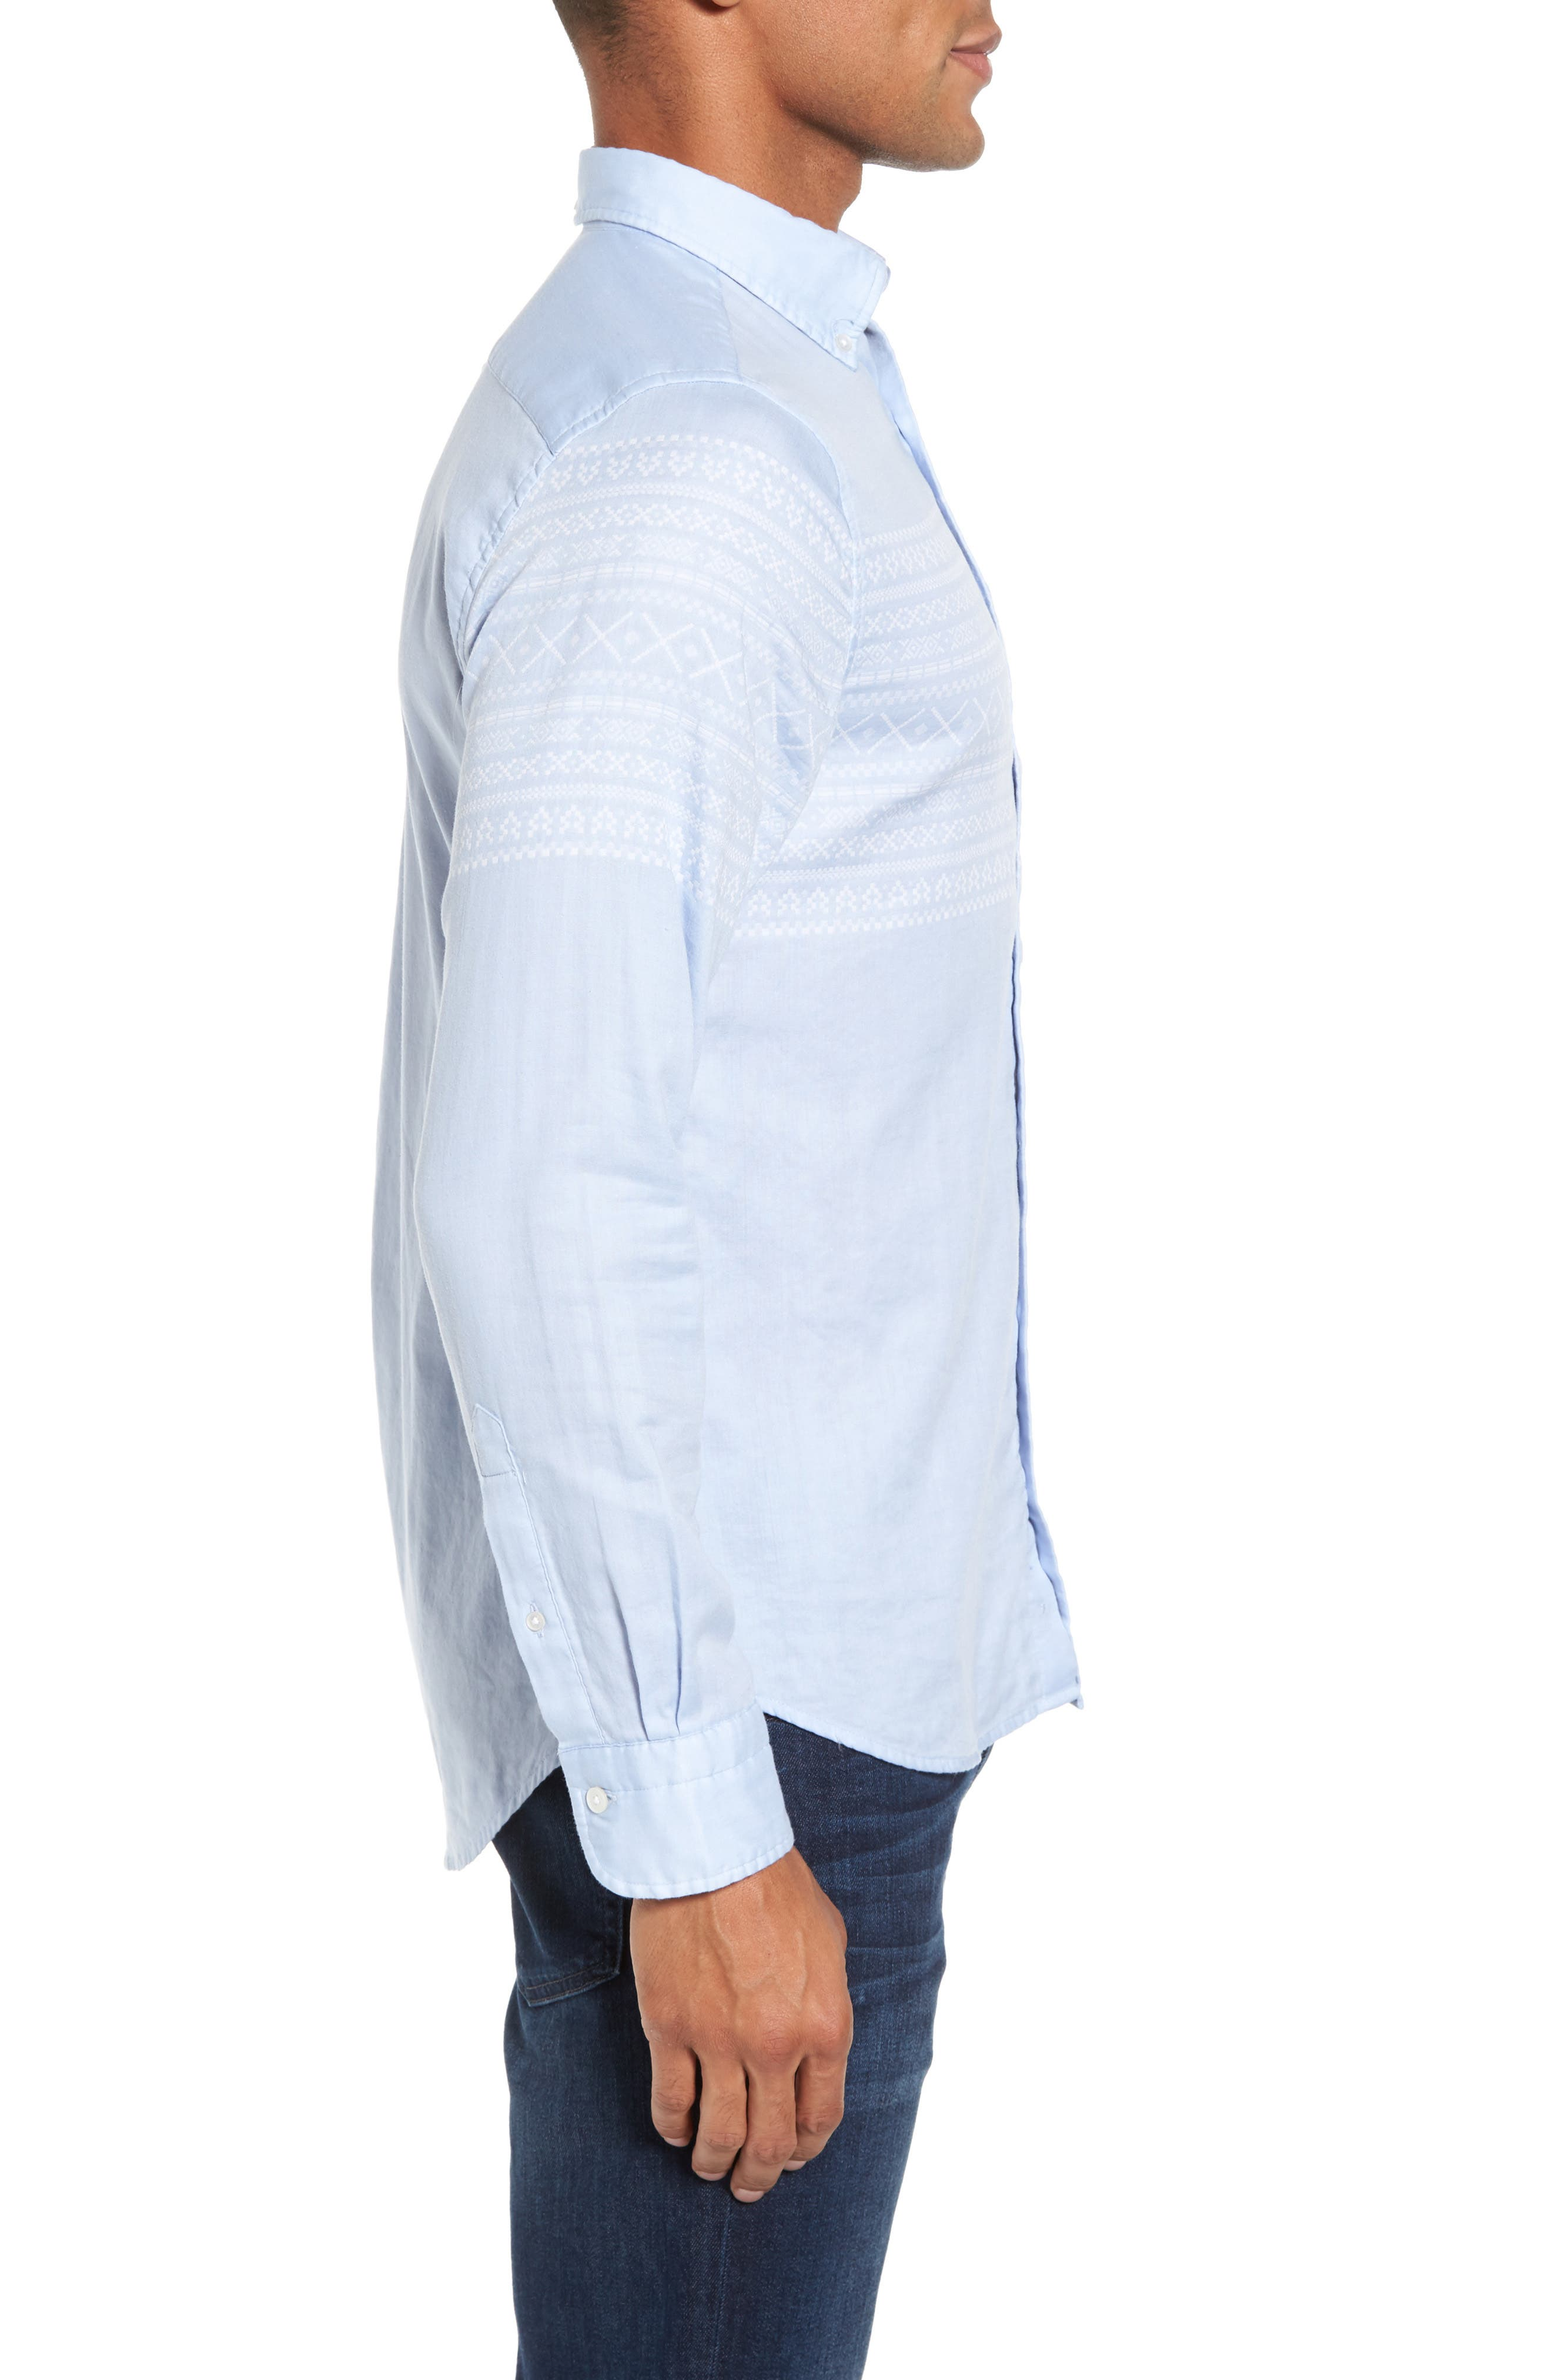 02 Extra Slim Fit Fair Isle Print Sport Shirt,                             Alternate thumbnail 3, color,                             420